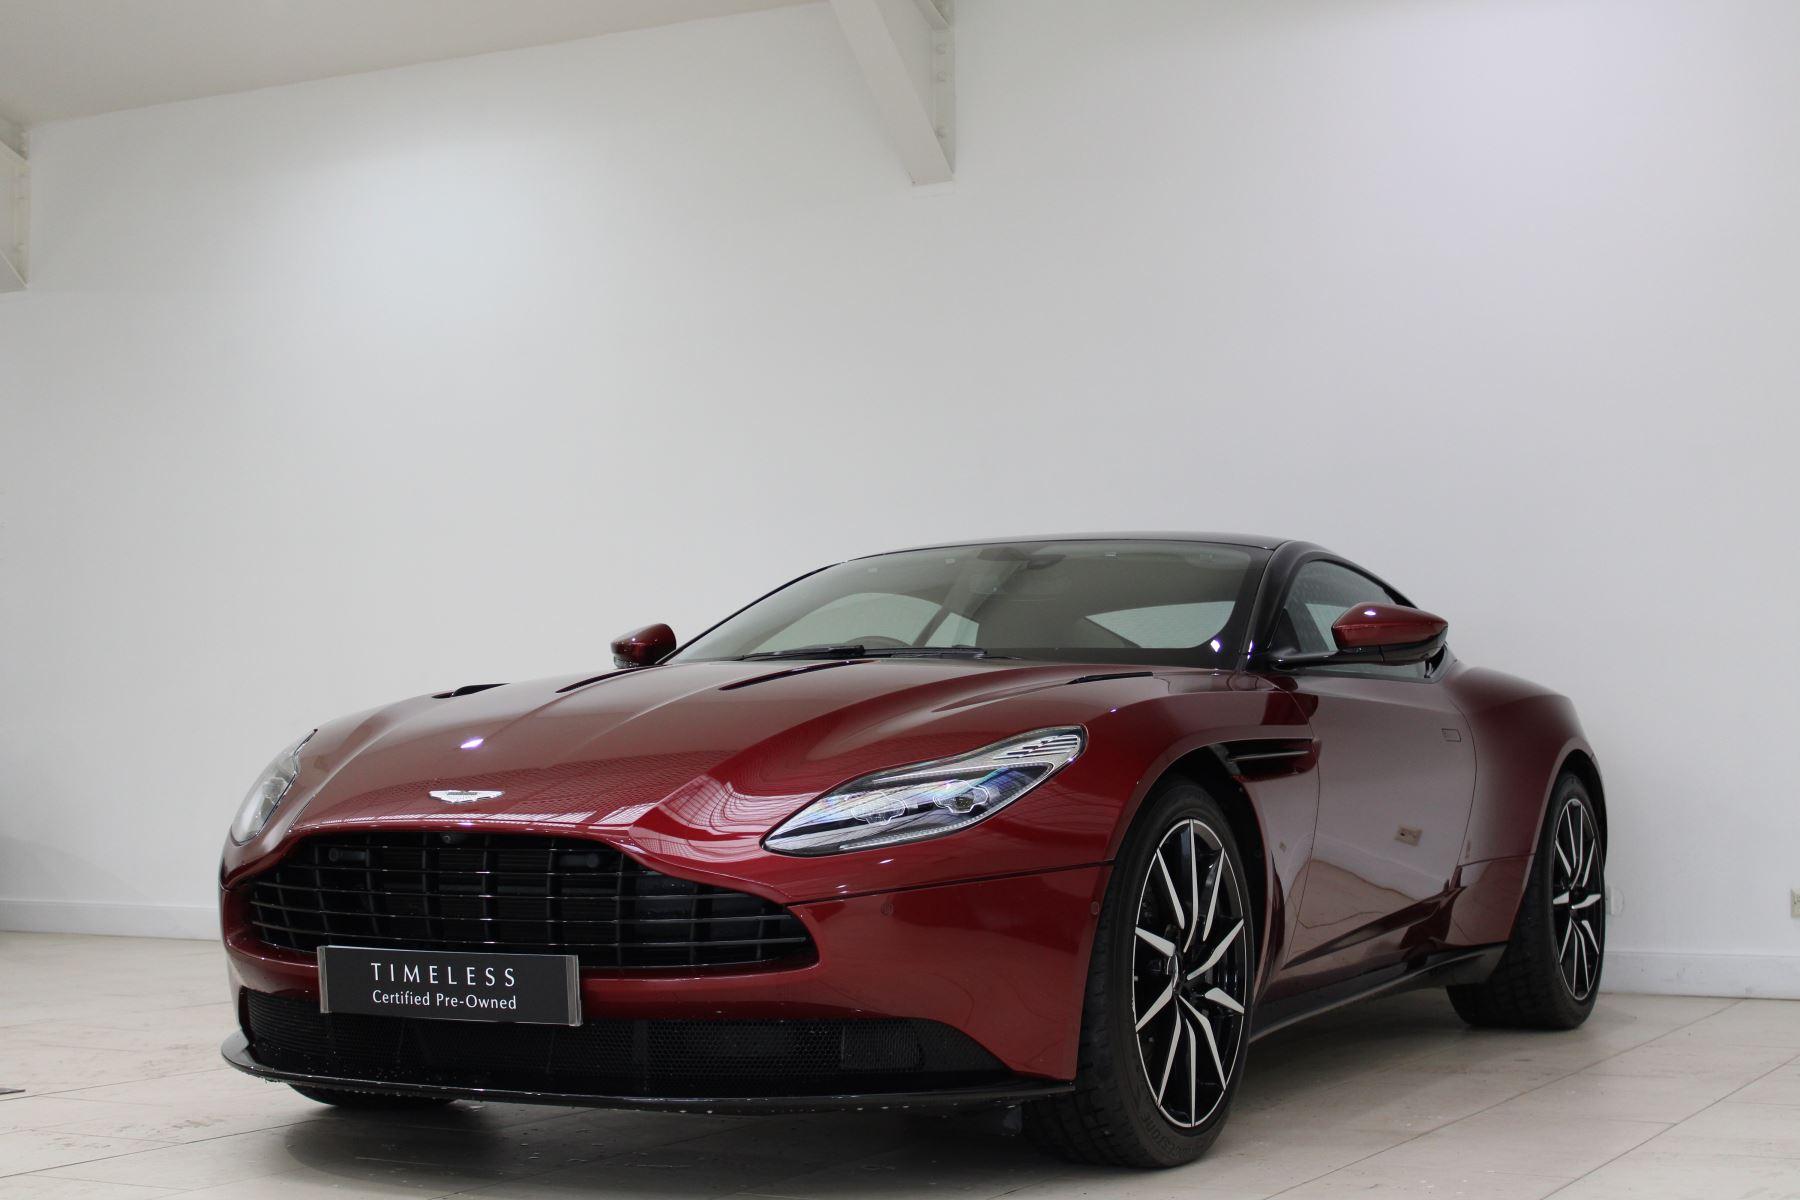 Aston Martin DB11 V12 2dr Touchtronic image 1